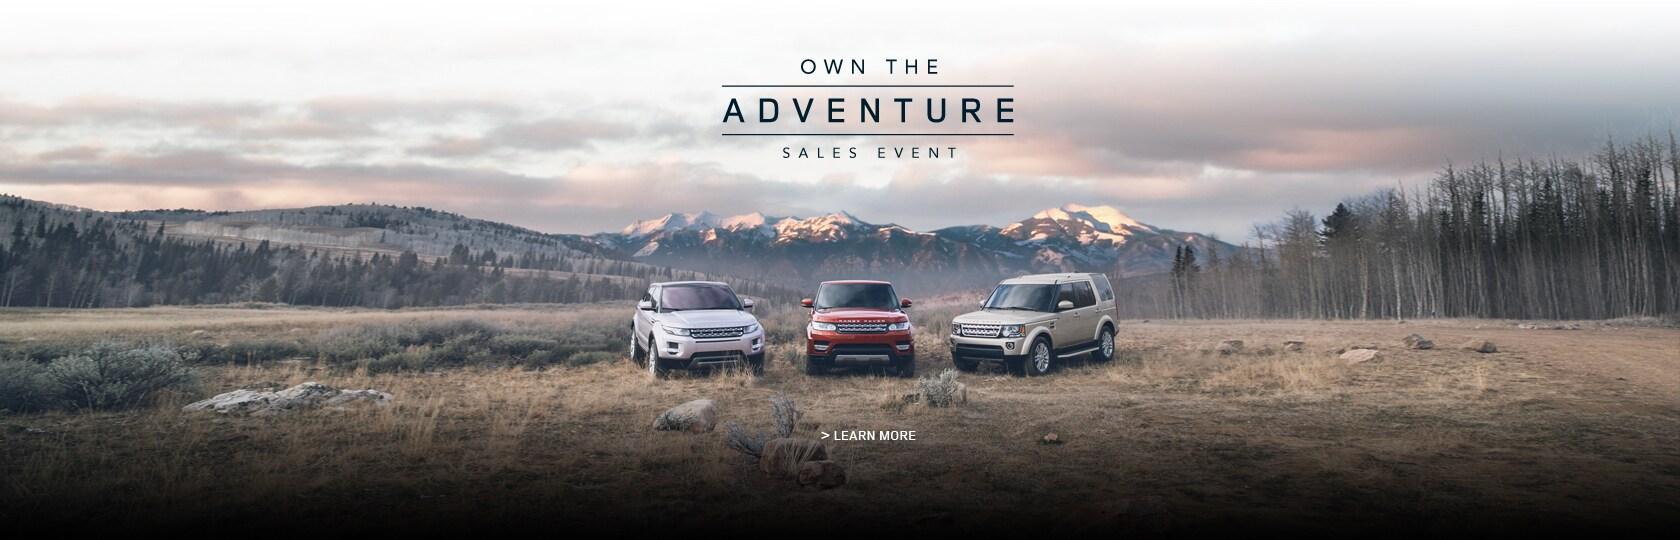 Land Rover Dealership Michigan >> Farmington Hills's Land Rover Dealership | New and Used Land Rover Luxury Cars | Serving Detroit ...